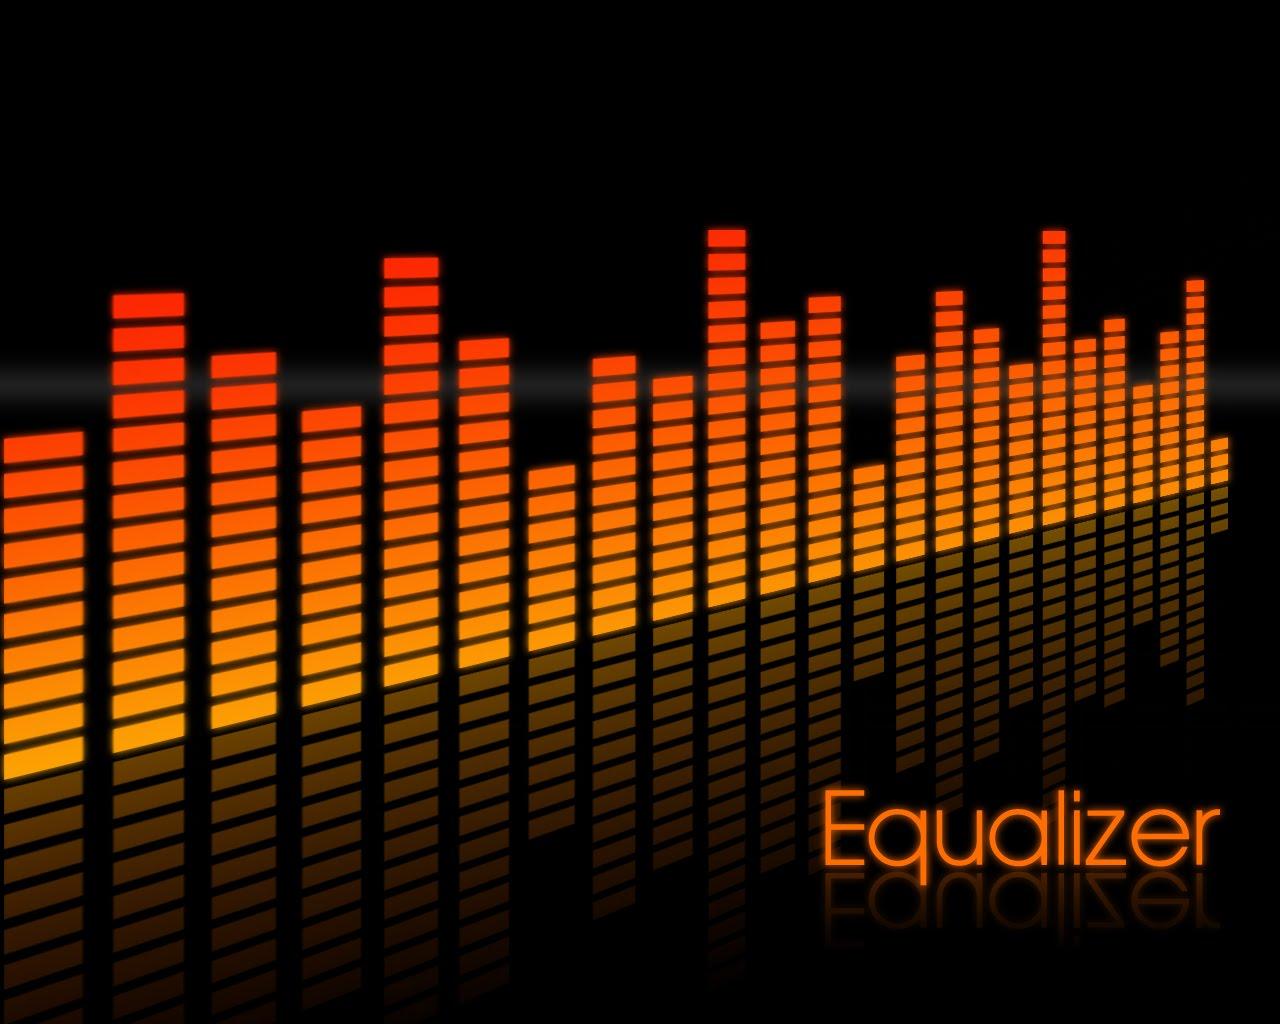 http://3.bp.blogspot.com/-S5-giR_yMWA/T9G8A0wlCuI/AAAAAAAAANs/LS1OuL7g5gE/s1600/house_electro_trance_music_Equalizer_Wallpaper.jpg